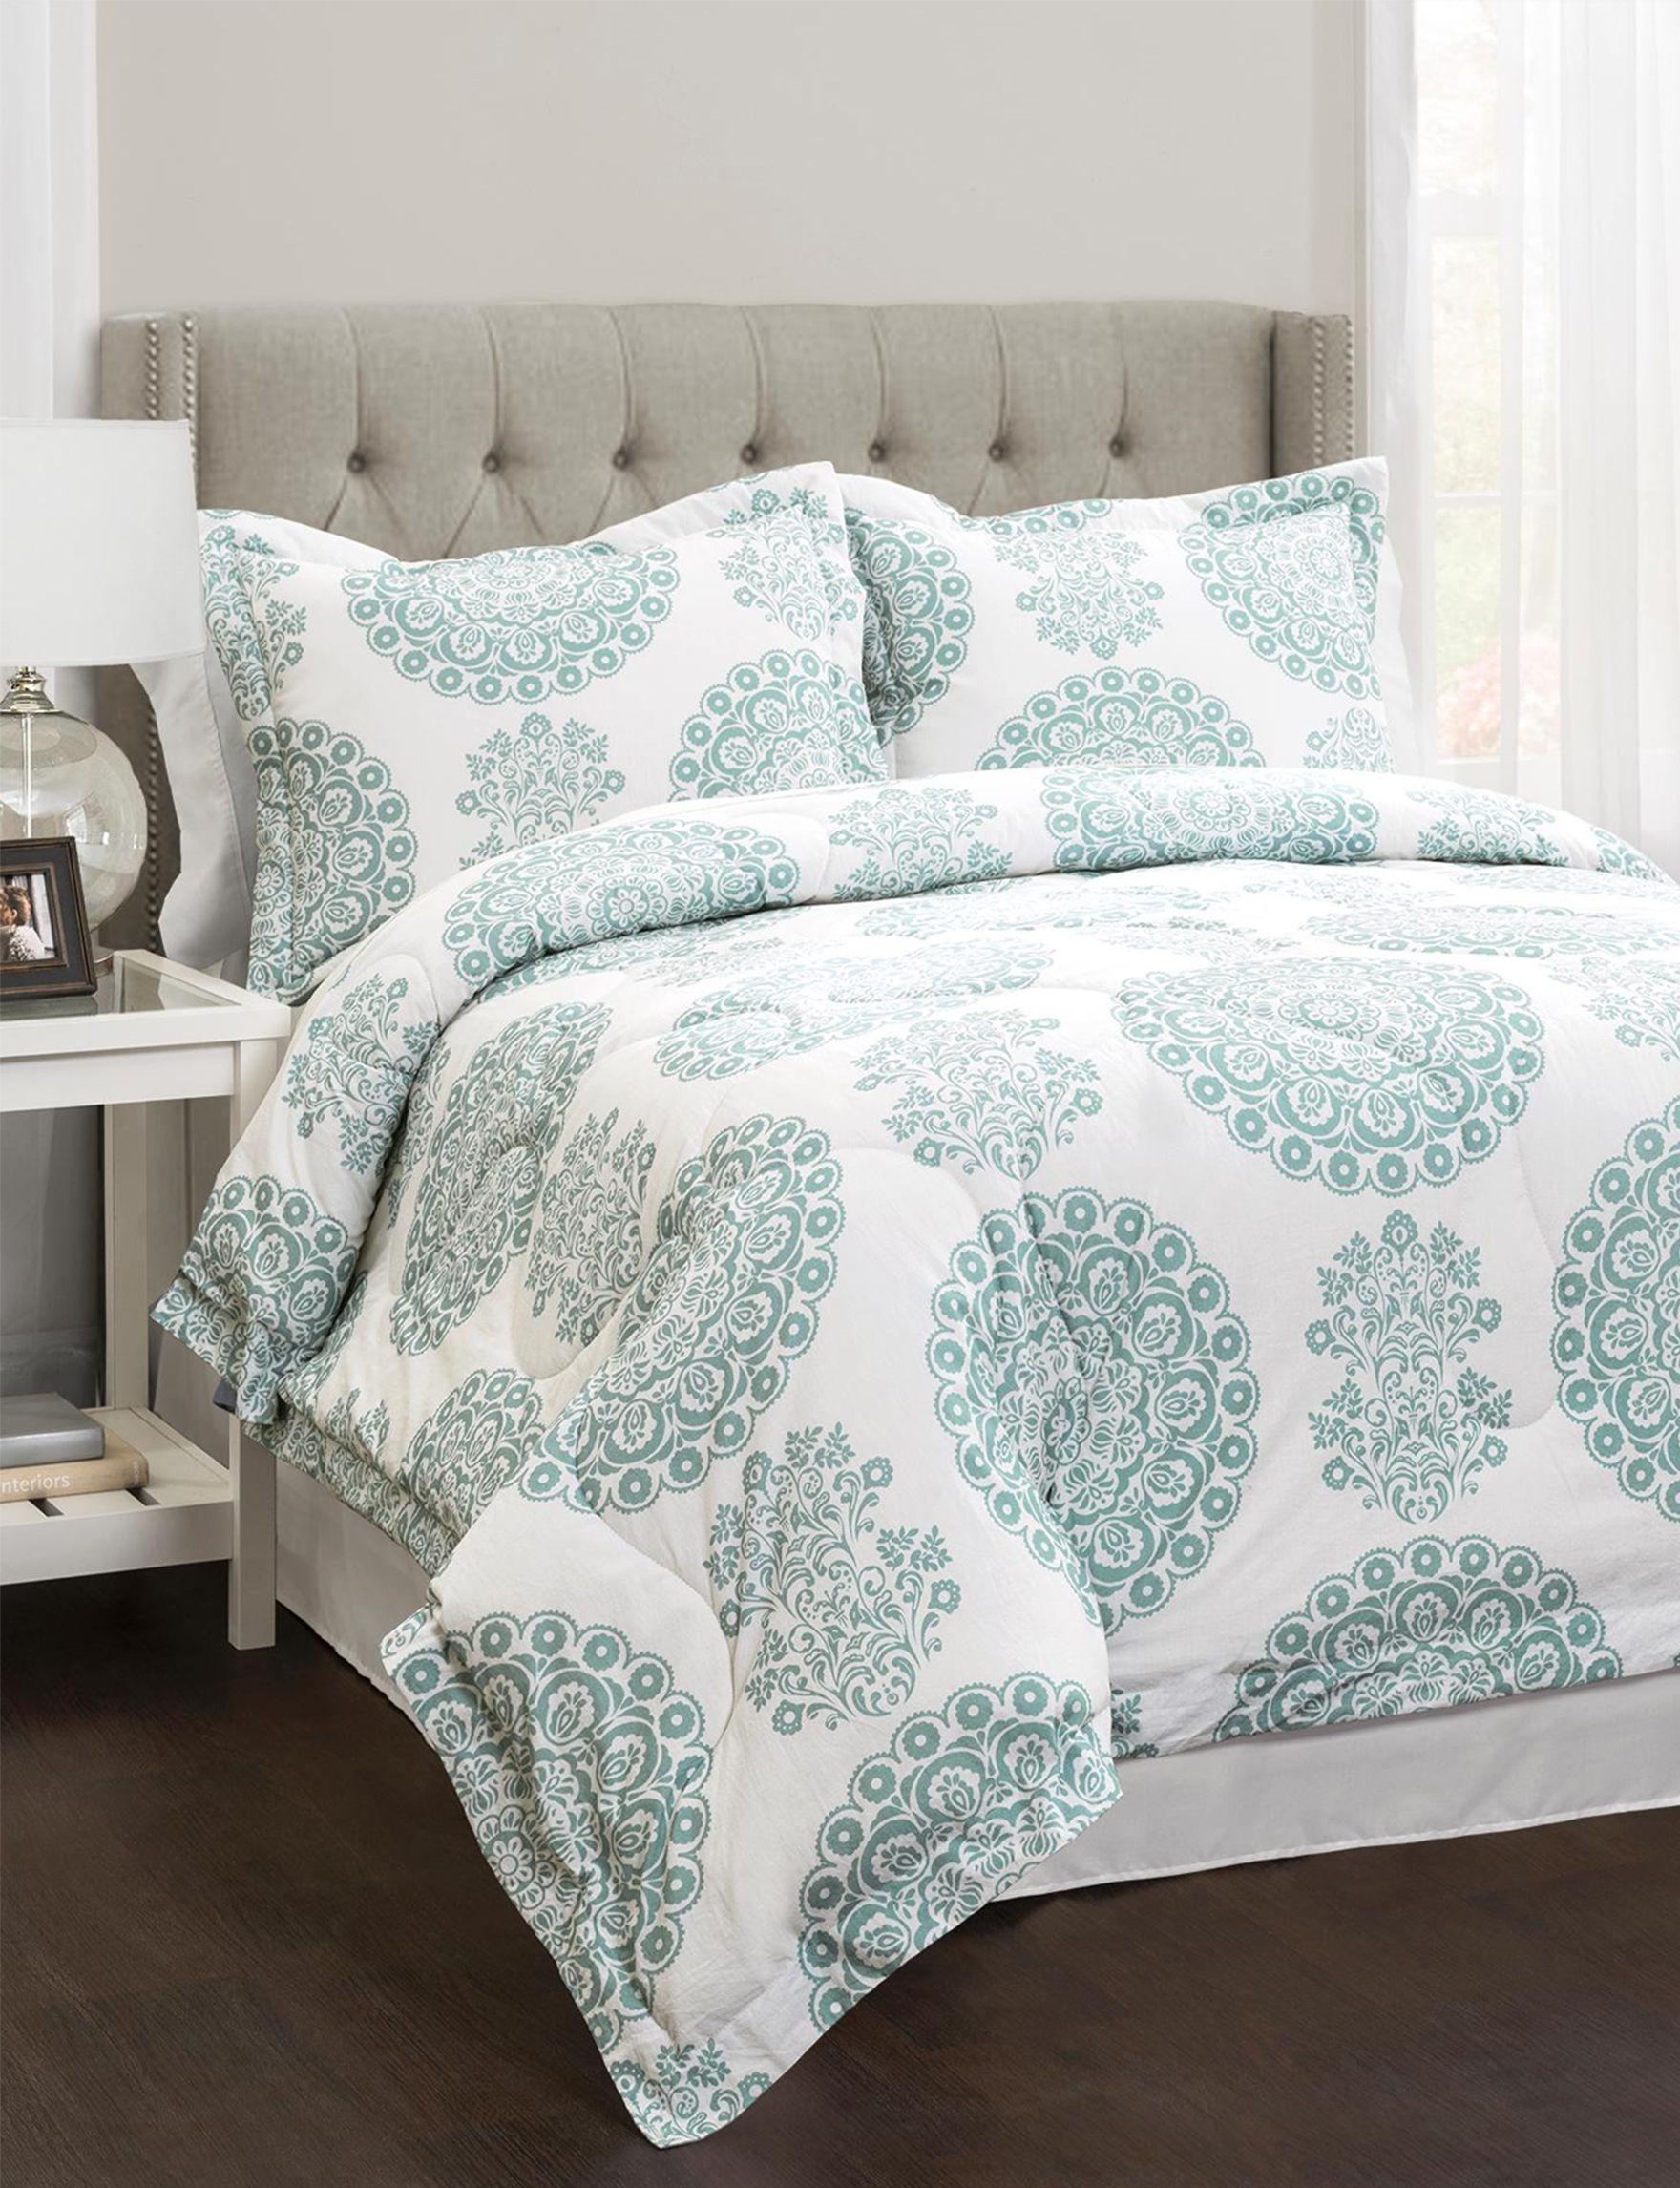 Lush Decor Green Comforters & Comforter Sets